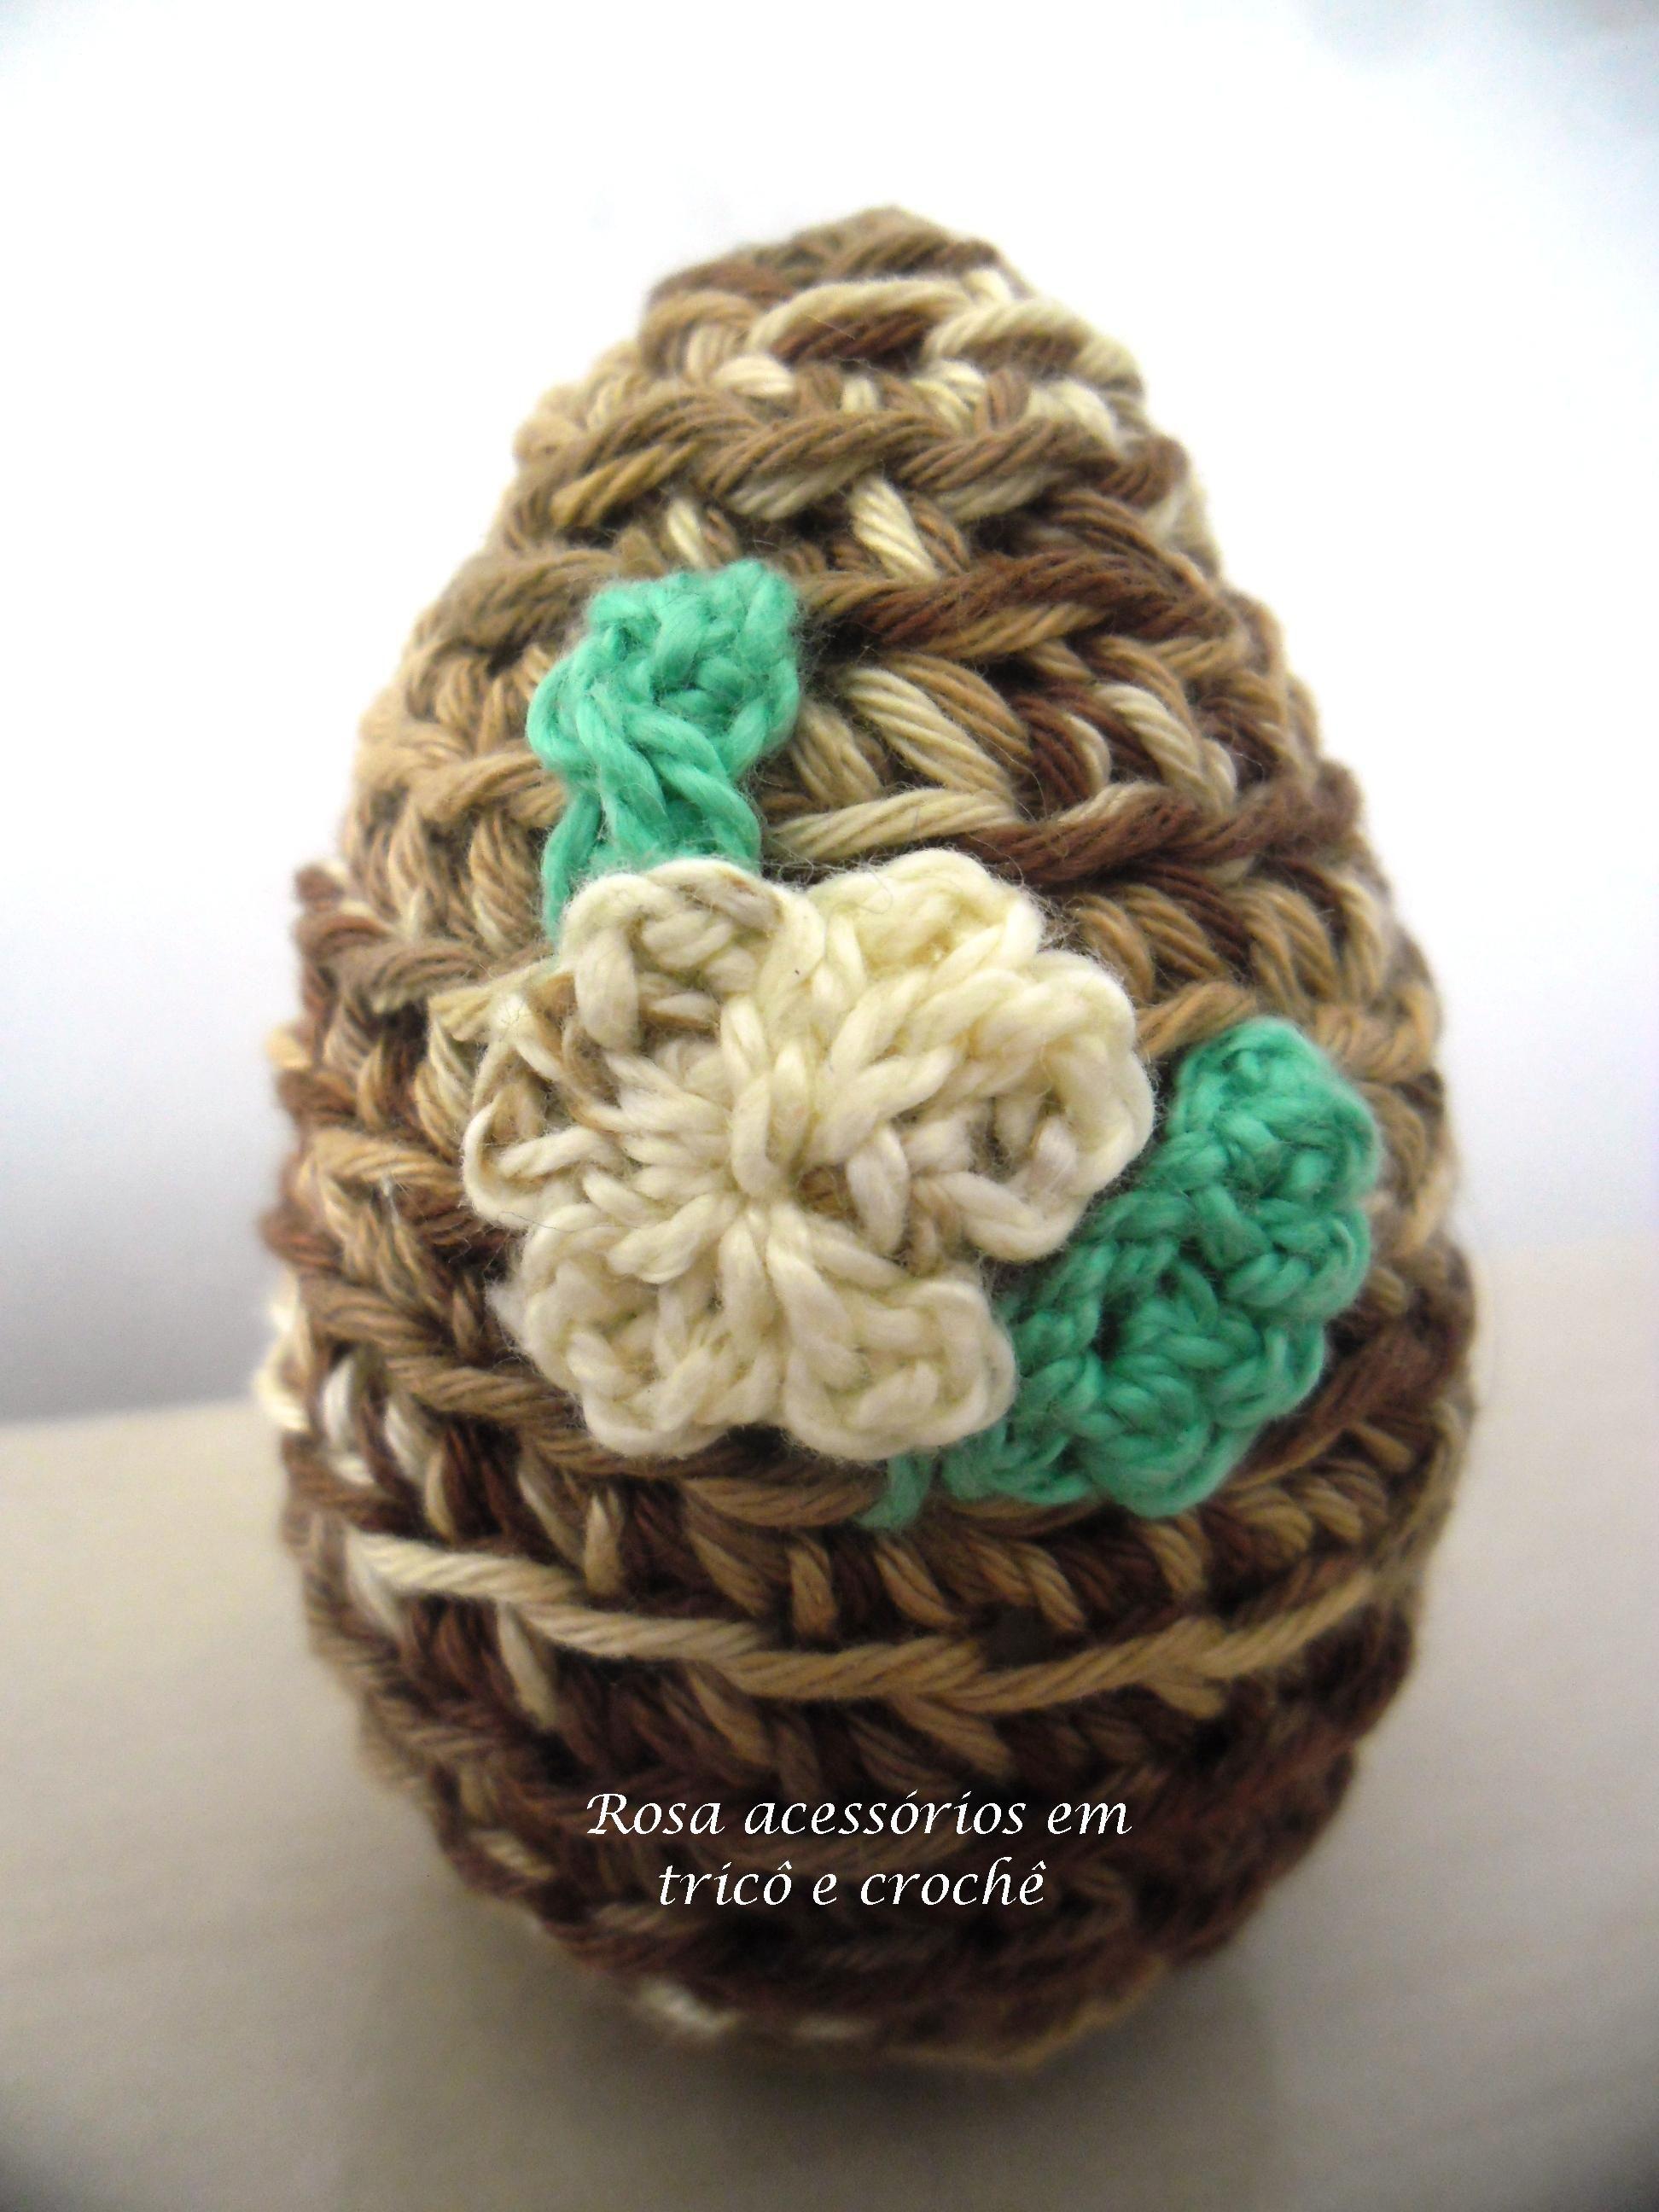 crochet egg easter, ovo crochê de páscoa www.rosaacessorios.blogspot.com